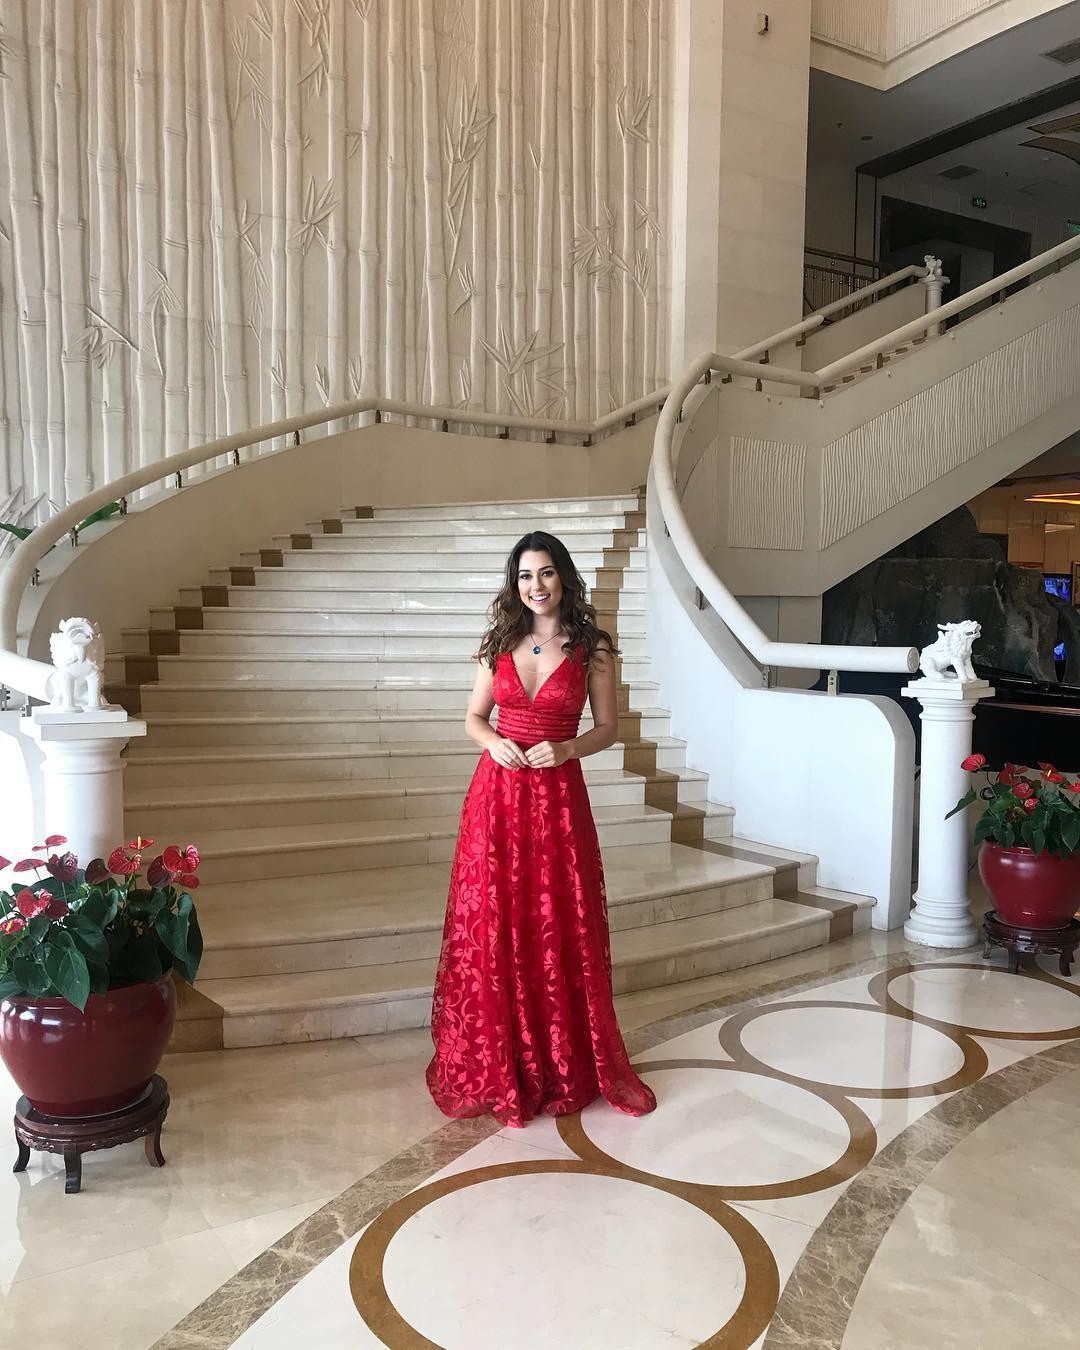 thais de mello candido, miss tourism world brazil 2018. - Página 3 40830511